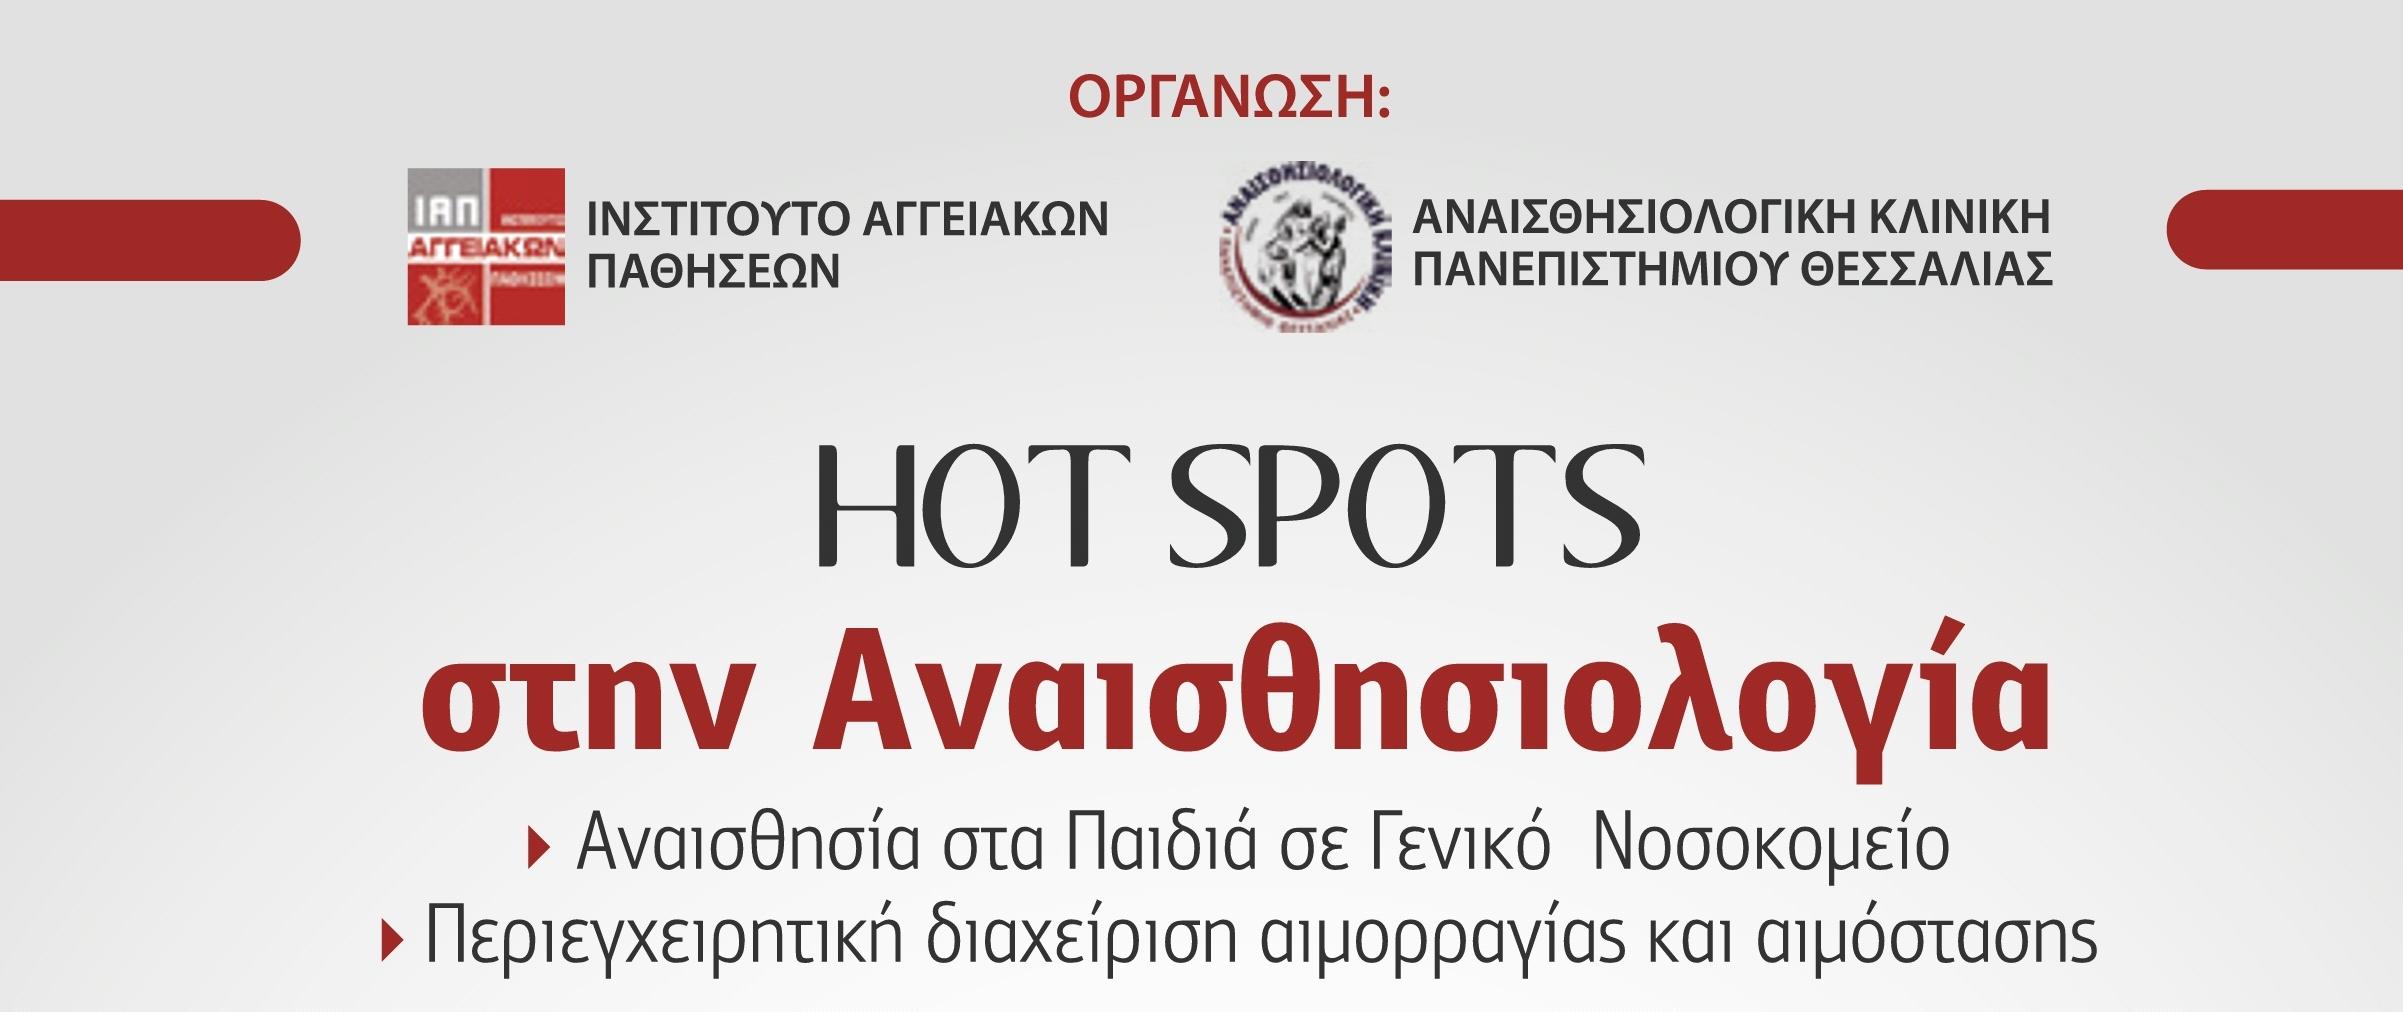 Hot Spots στην Αναισθησιολογία